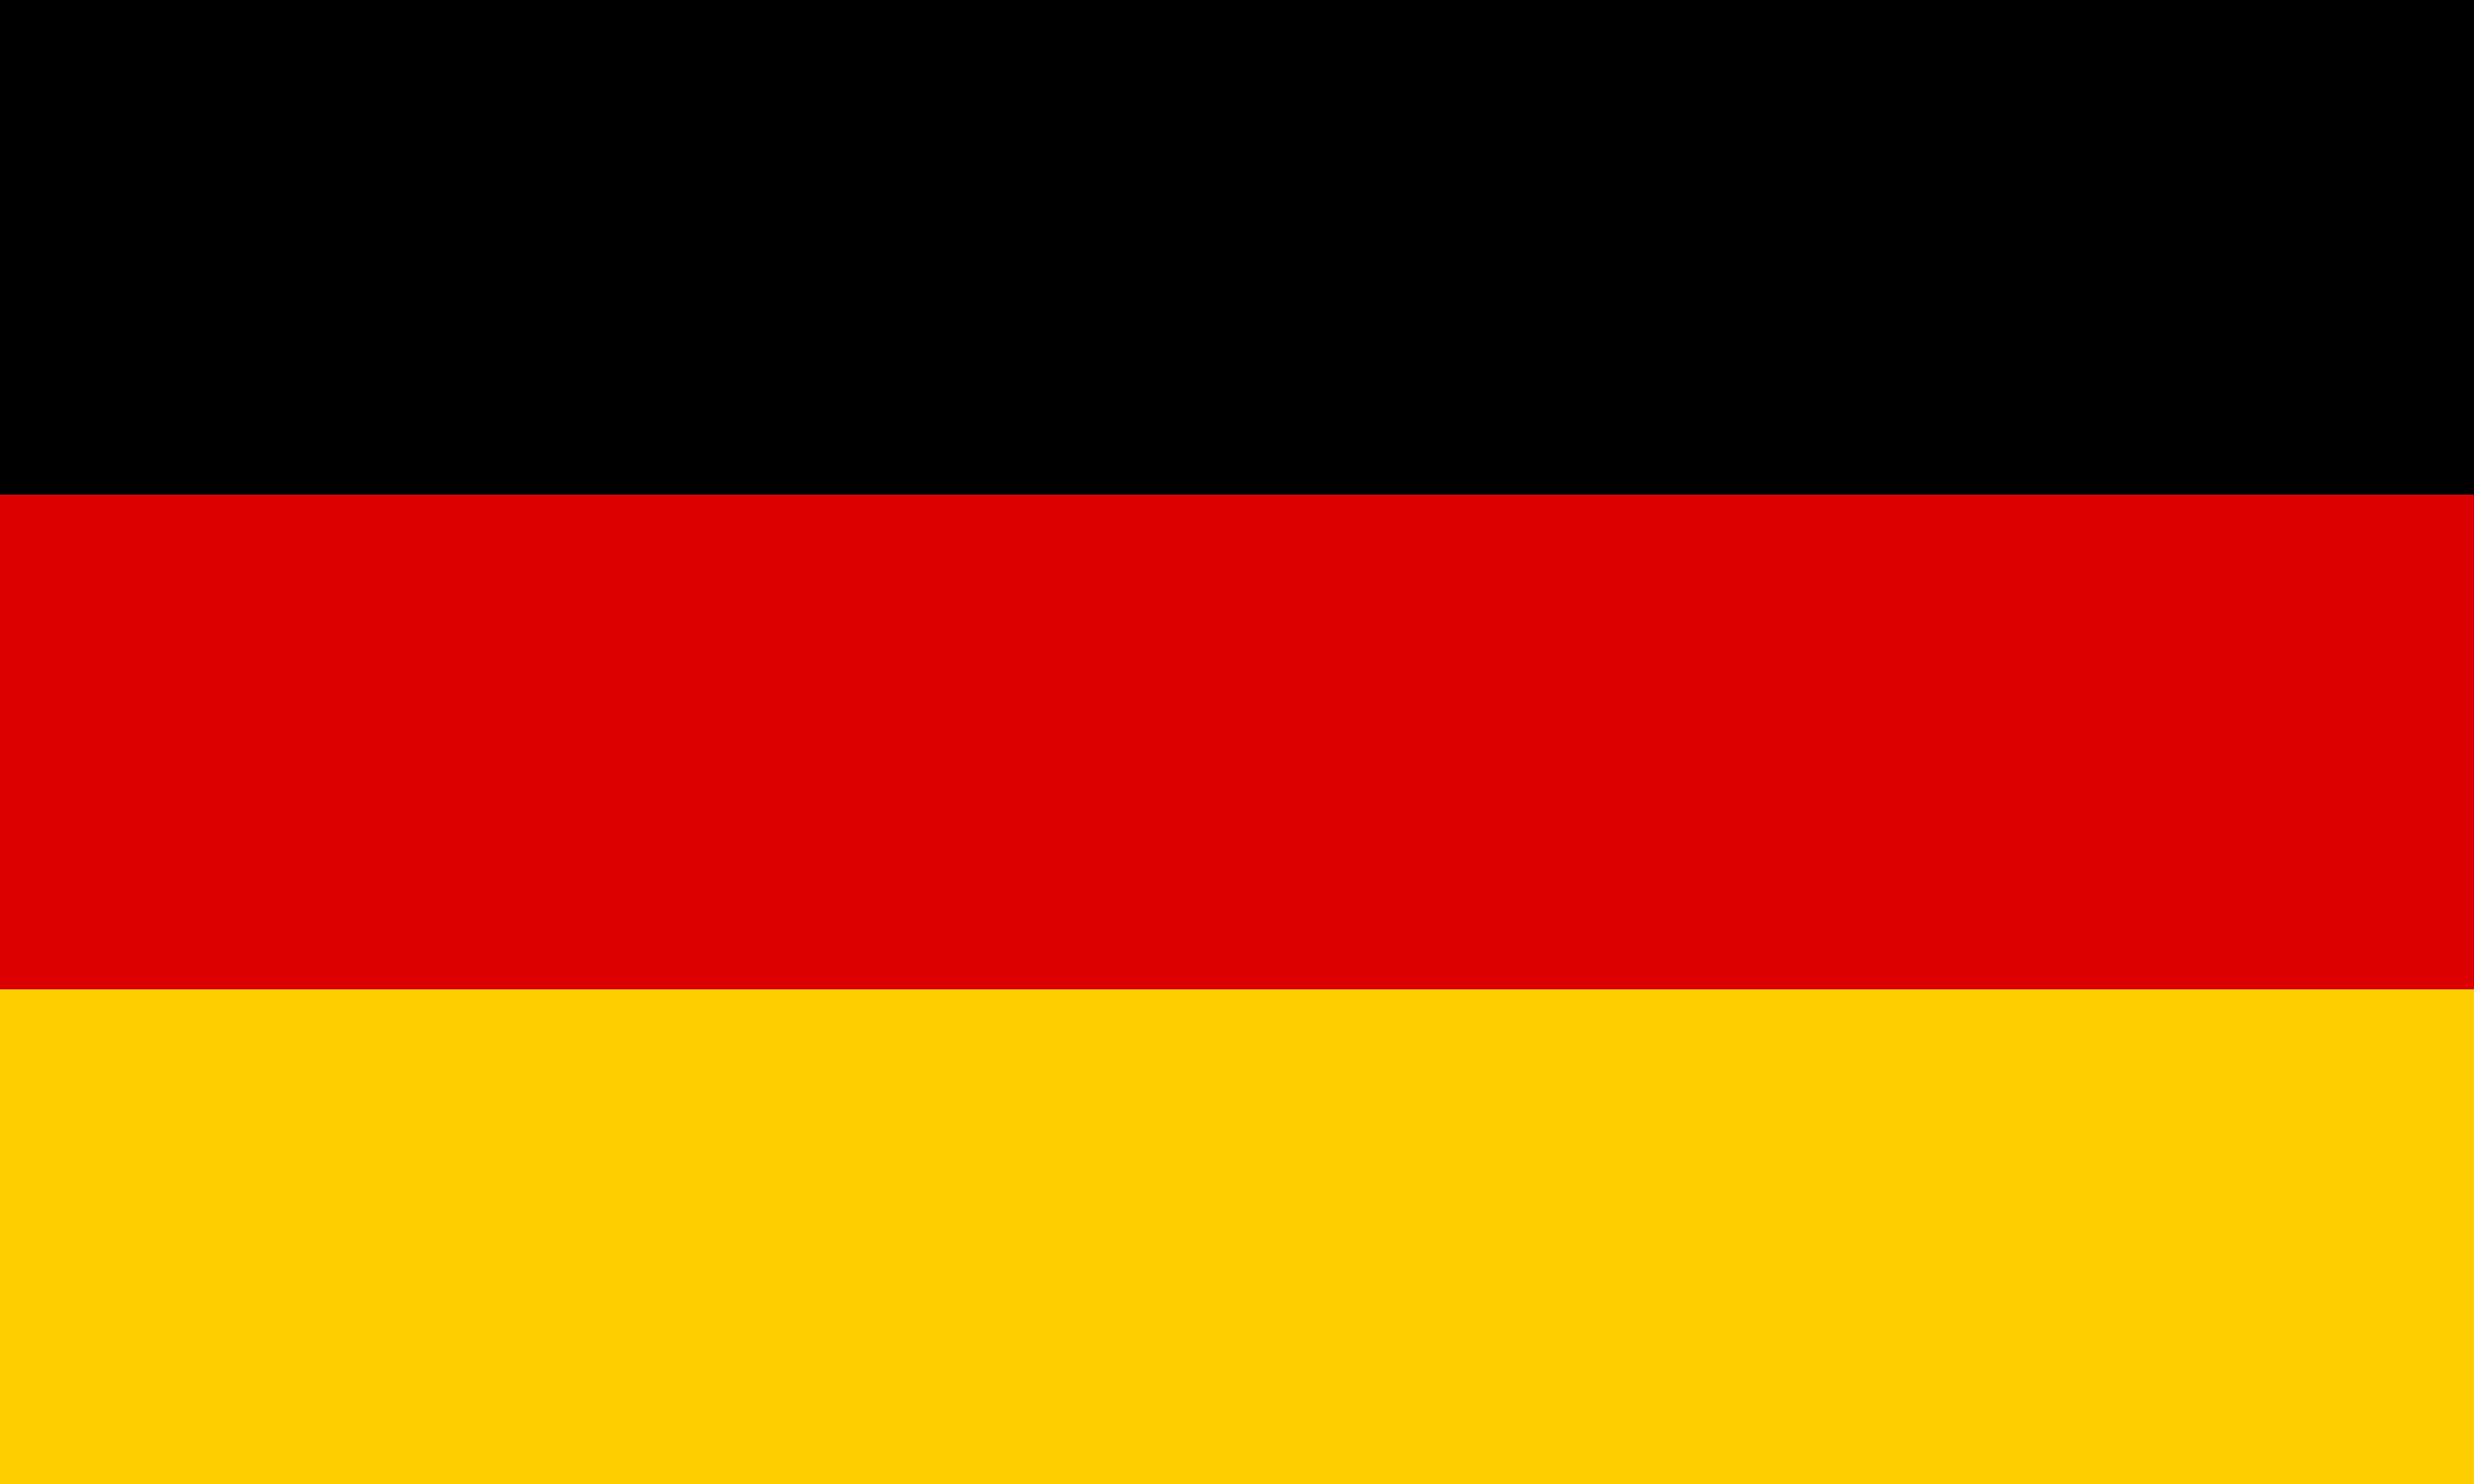 vlajka německa